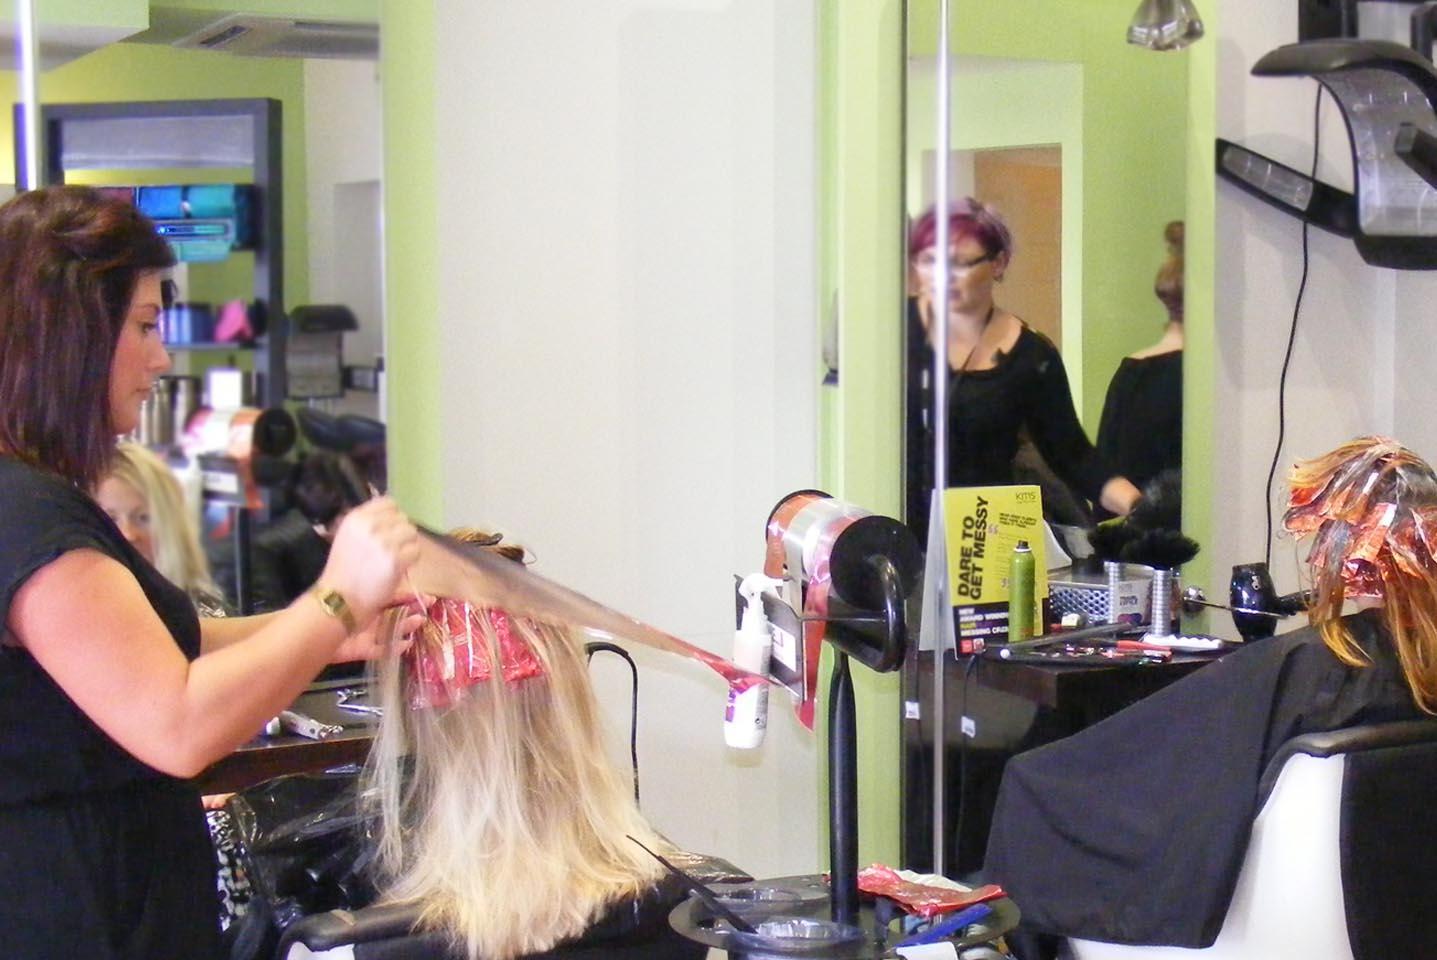 Hair Stylist styles clients hair in busy Hair Salon - Nuneaton Hair Salon - Hair Cutts